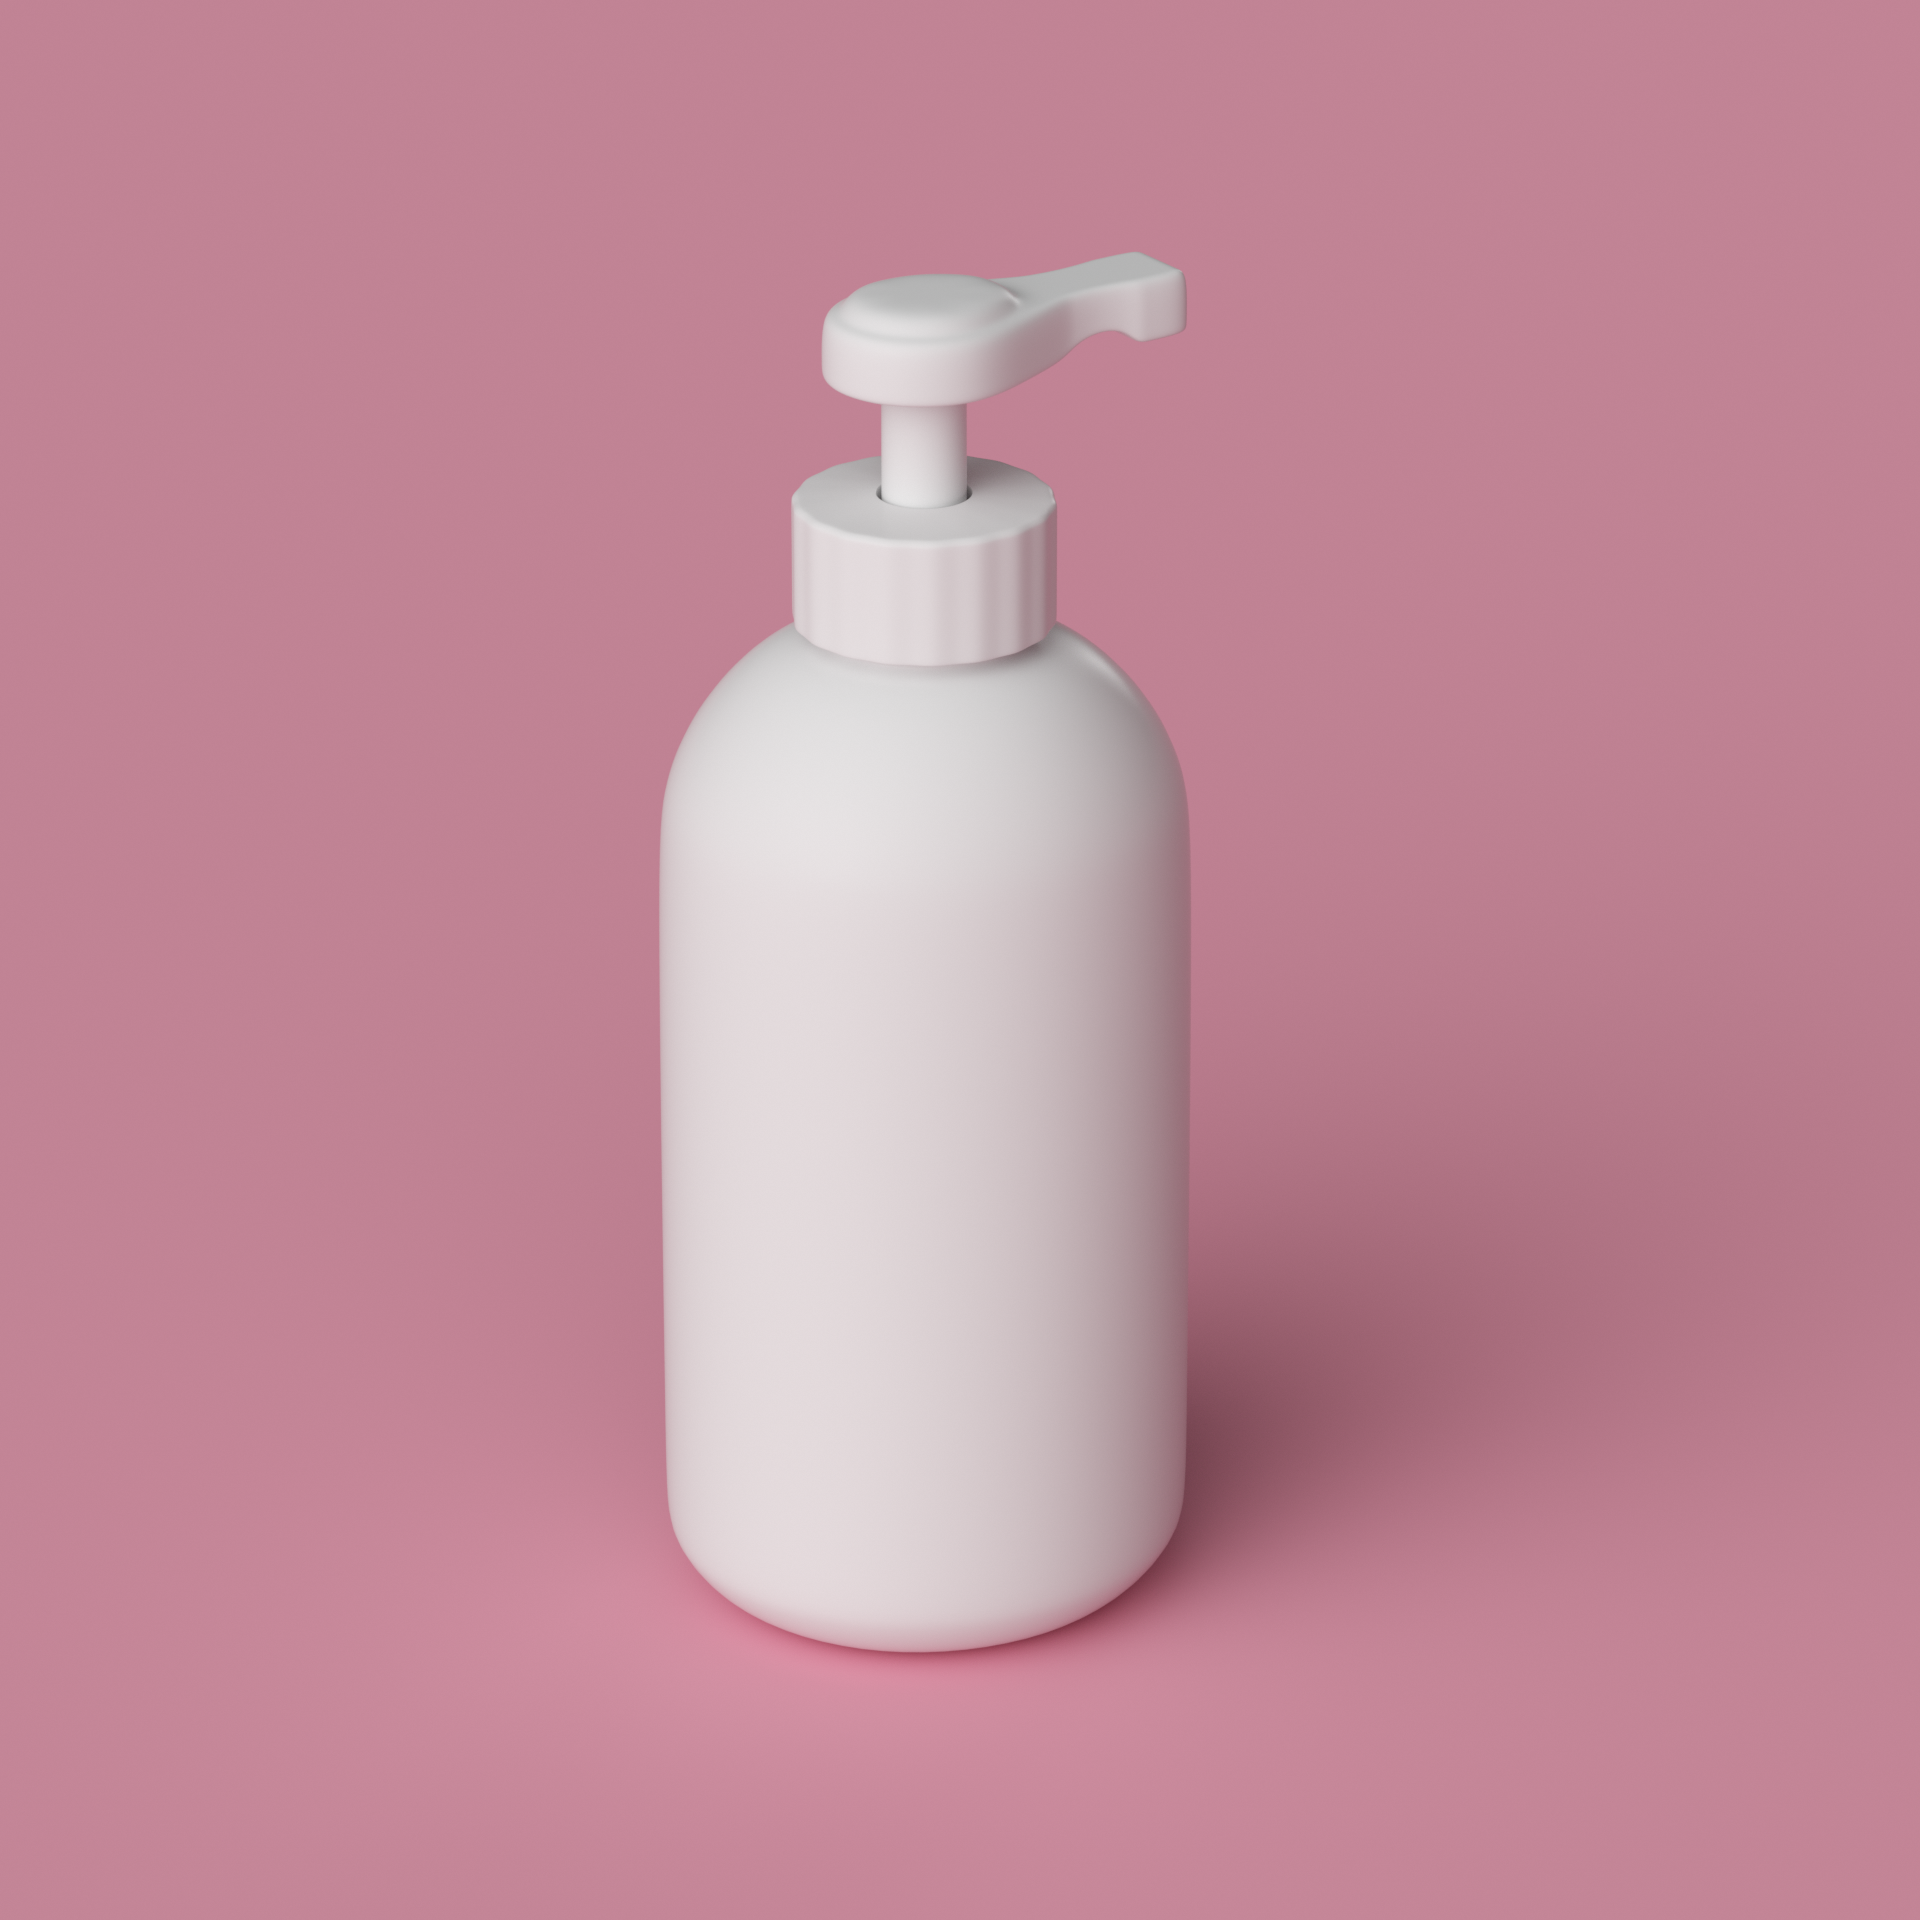 soap_dispenser.png